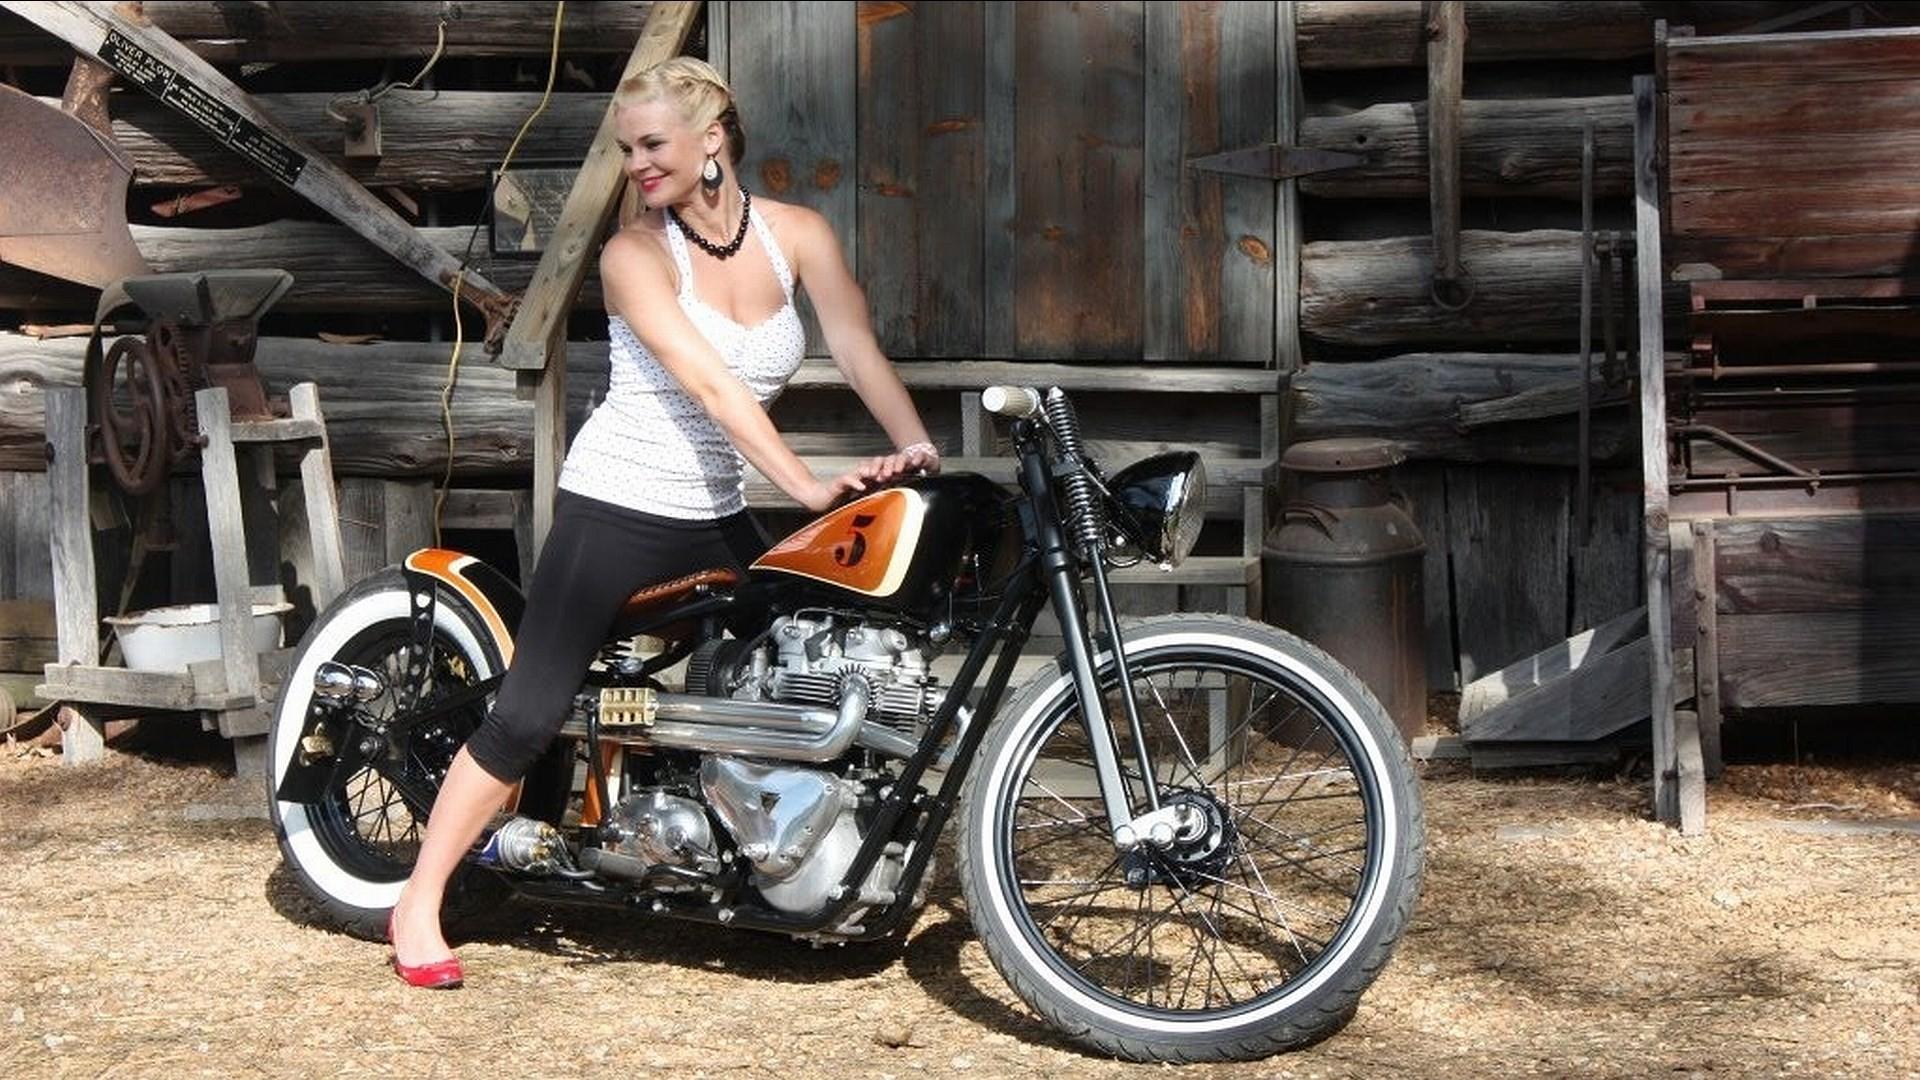 girls and motorcycles wallpaper – Full HD Wallpapers, Photos, Keshon Bishop  2017-03-27